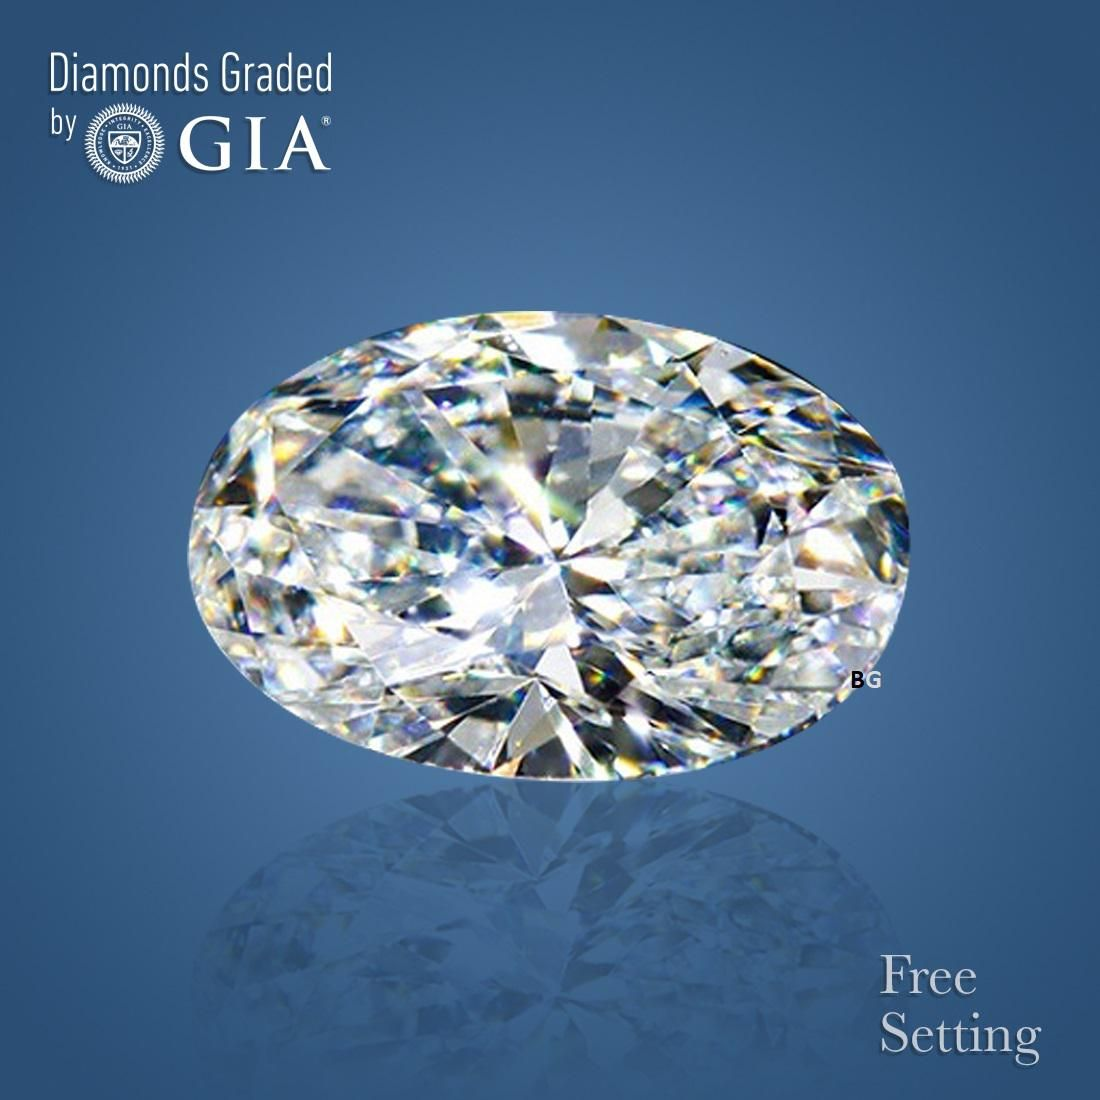 2.01 ct, Color I/VS1, Oval cut GIA Graded Diamond